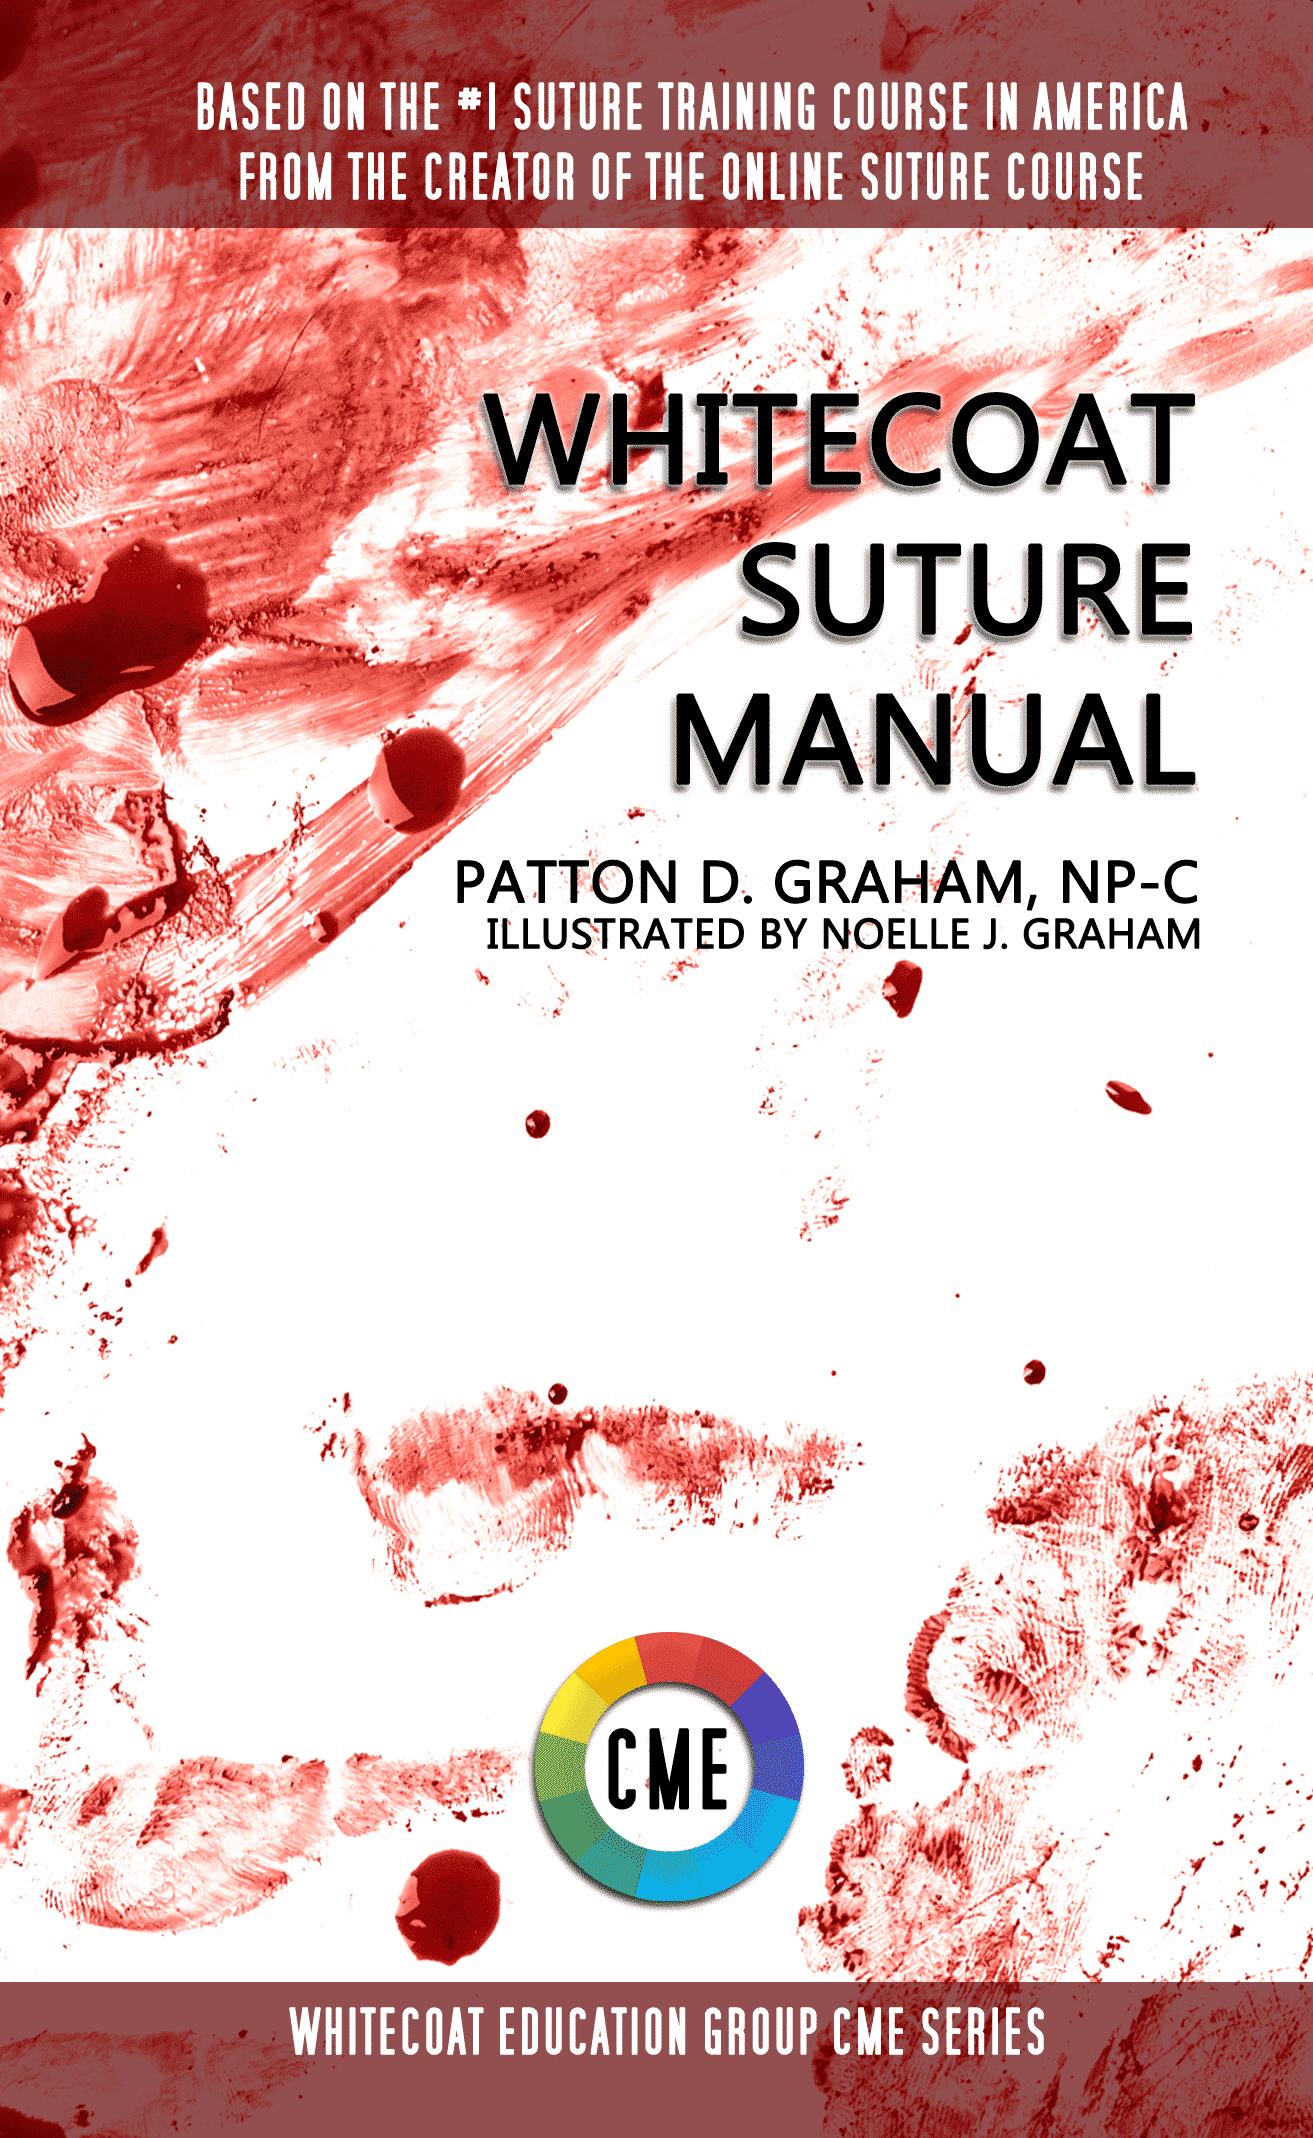 WhiteCoat Suture Manual